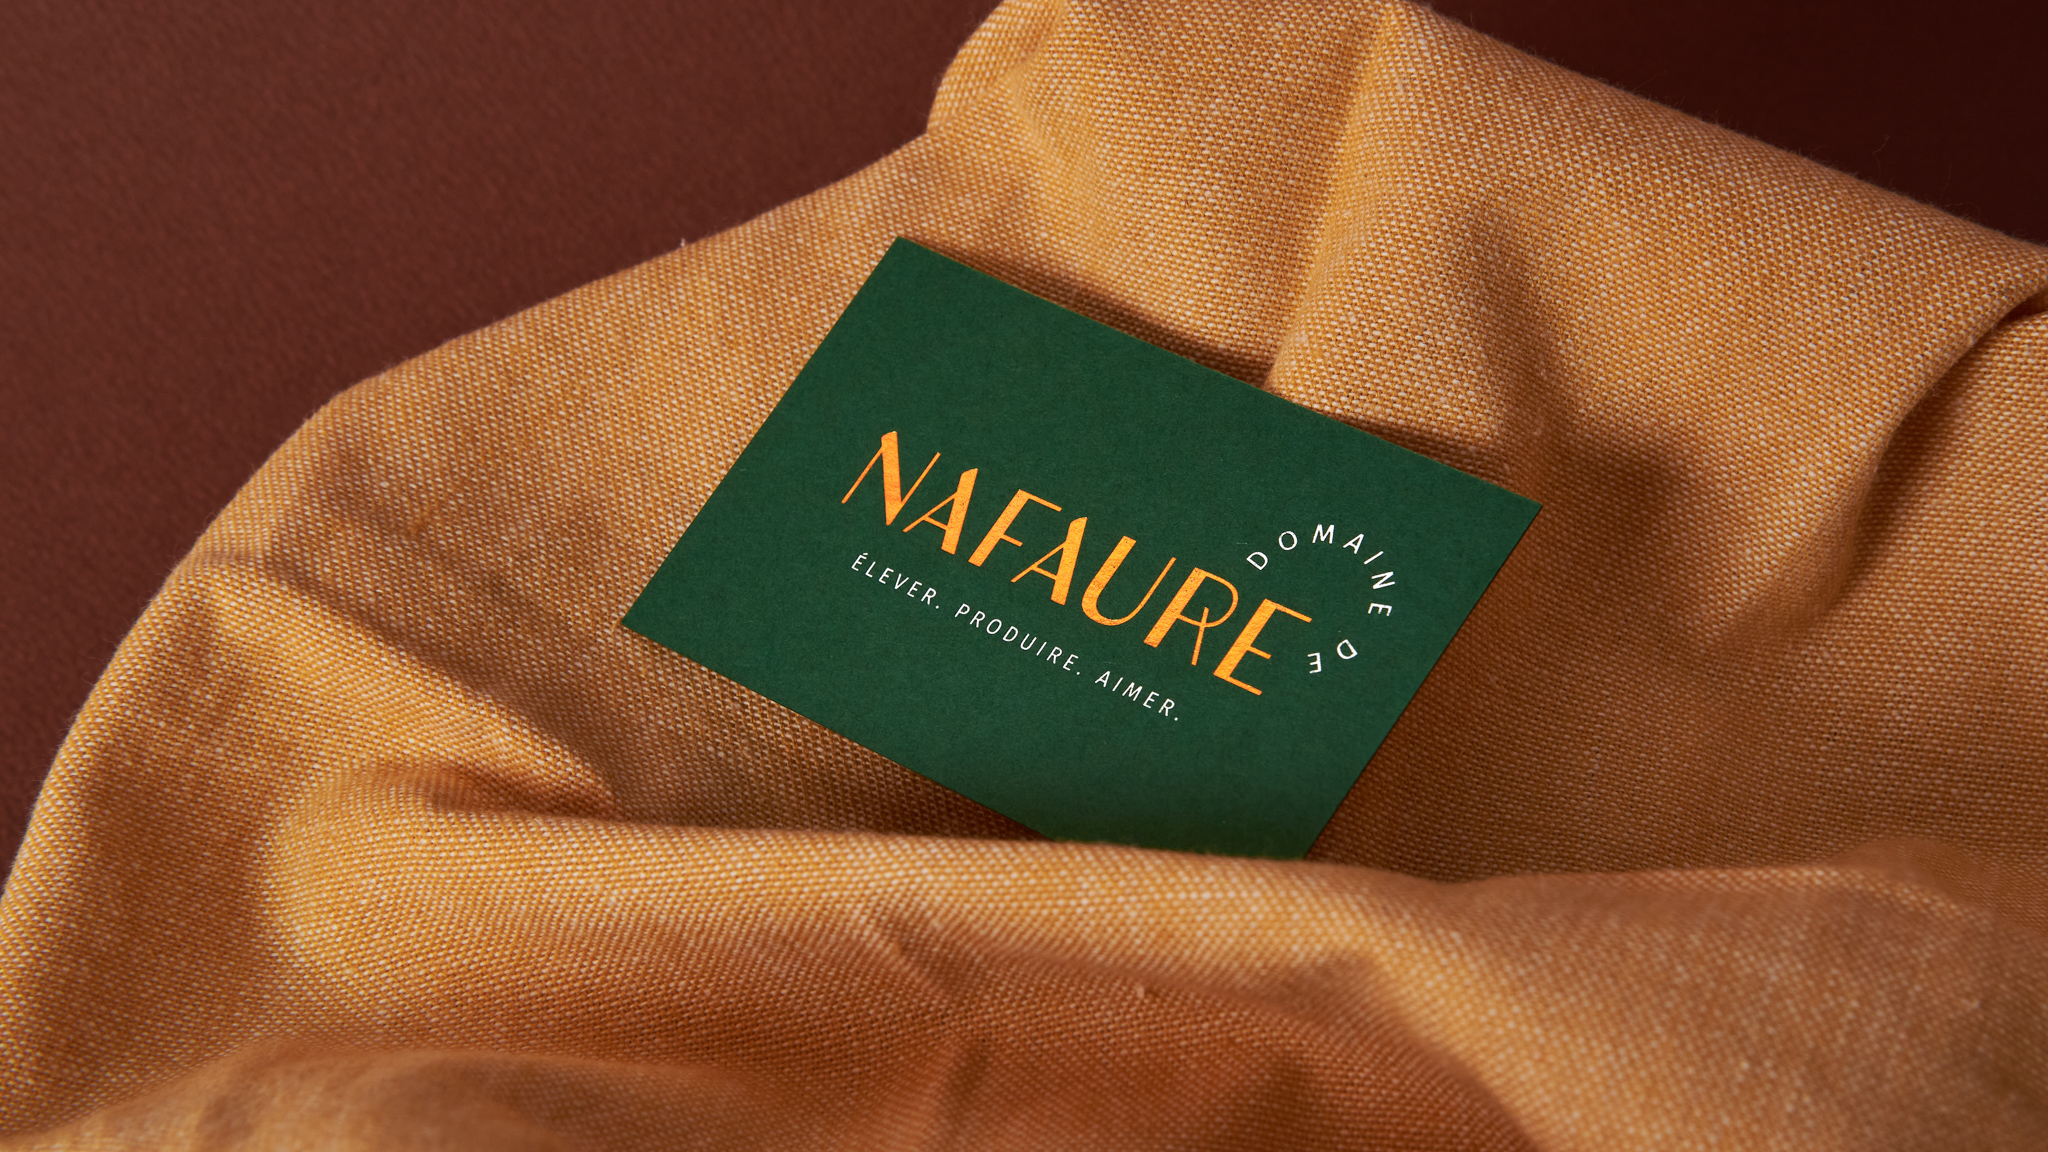 Domaine de Nafaure